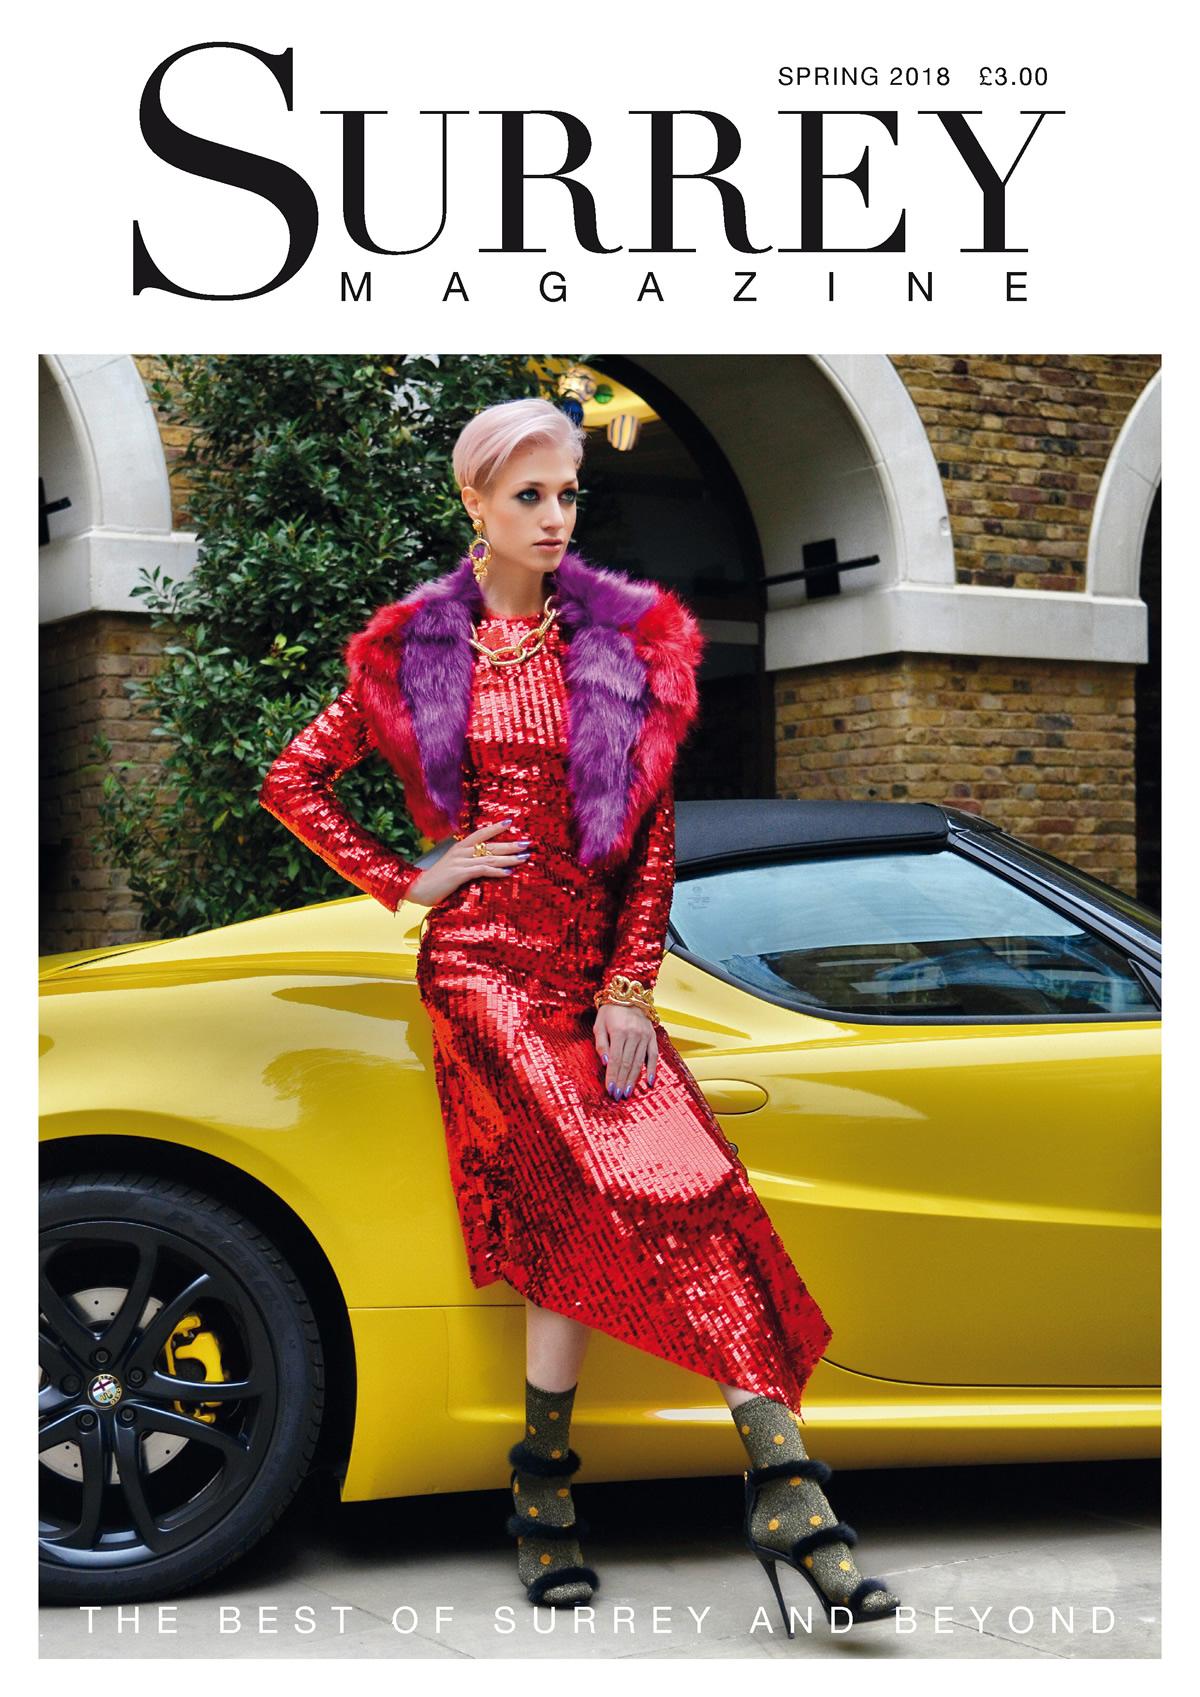 Surrey Magazine Spring 2018 Page 01